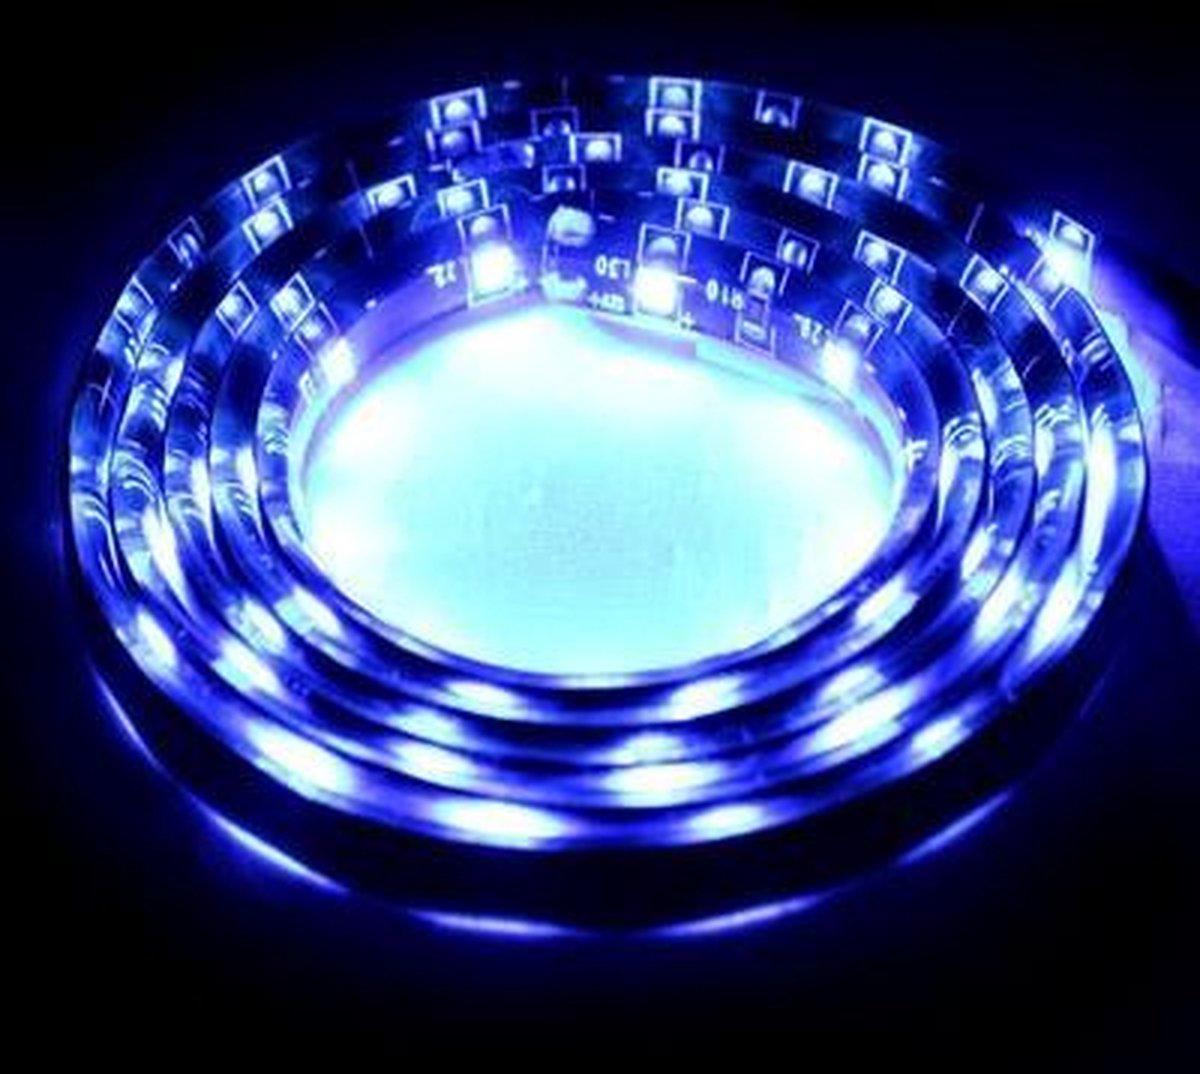 1.7W Blue Light 60 LED 3528 SMD Waterproof Flexibele Car Strip Light, DC 12V, lengte: 1m